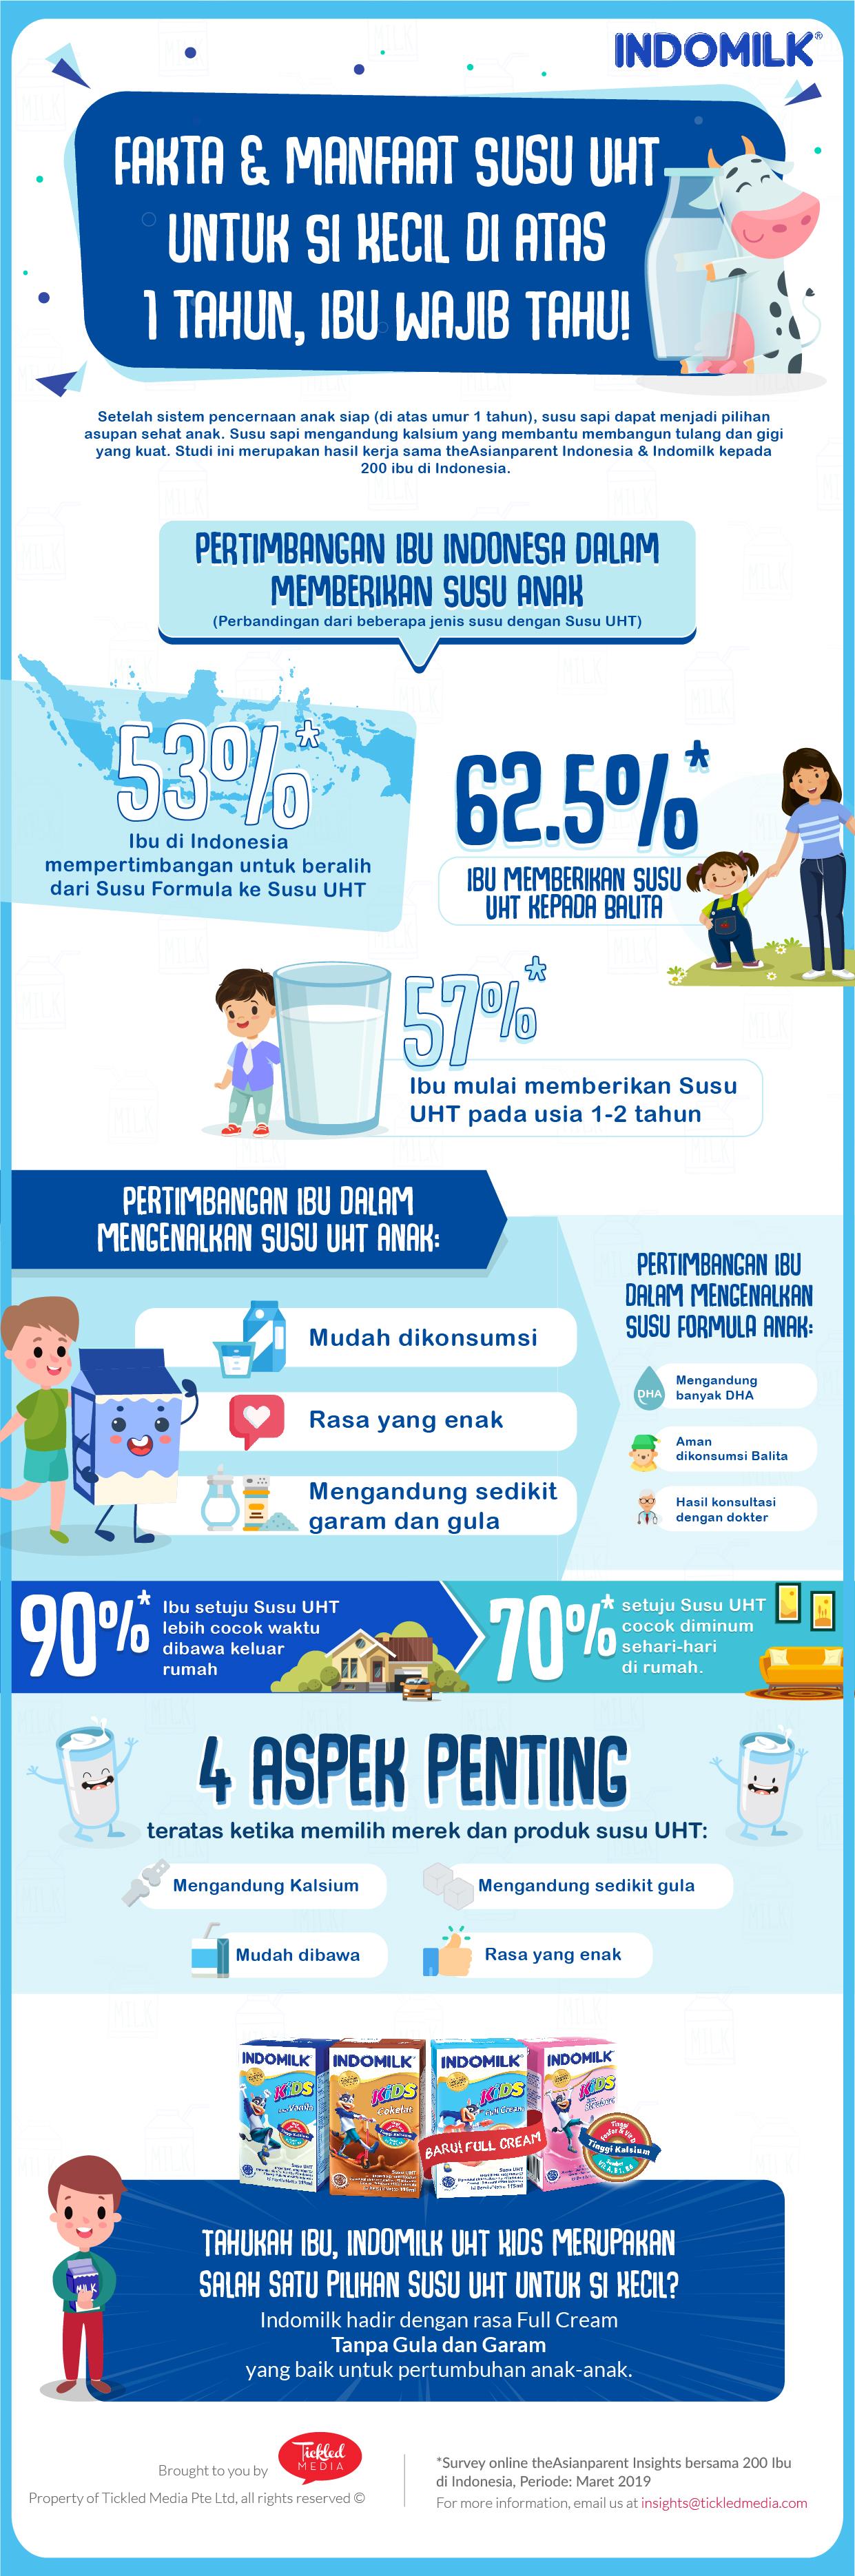 Fakta & Manfaat Susu UHT untuk Si Kecil di Atas 1 tahun, Ibu Wajib Tahu